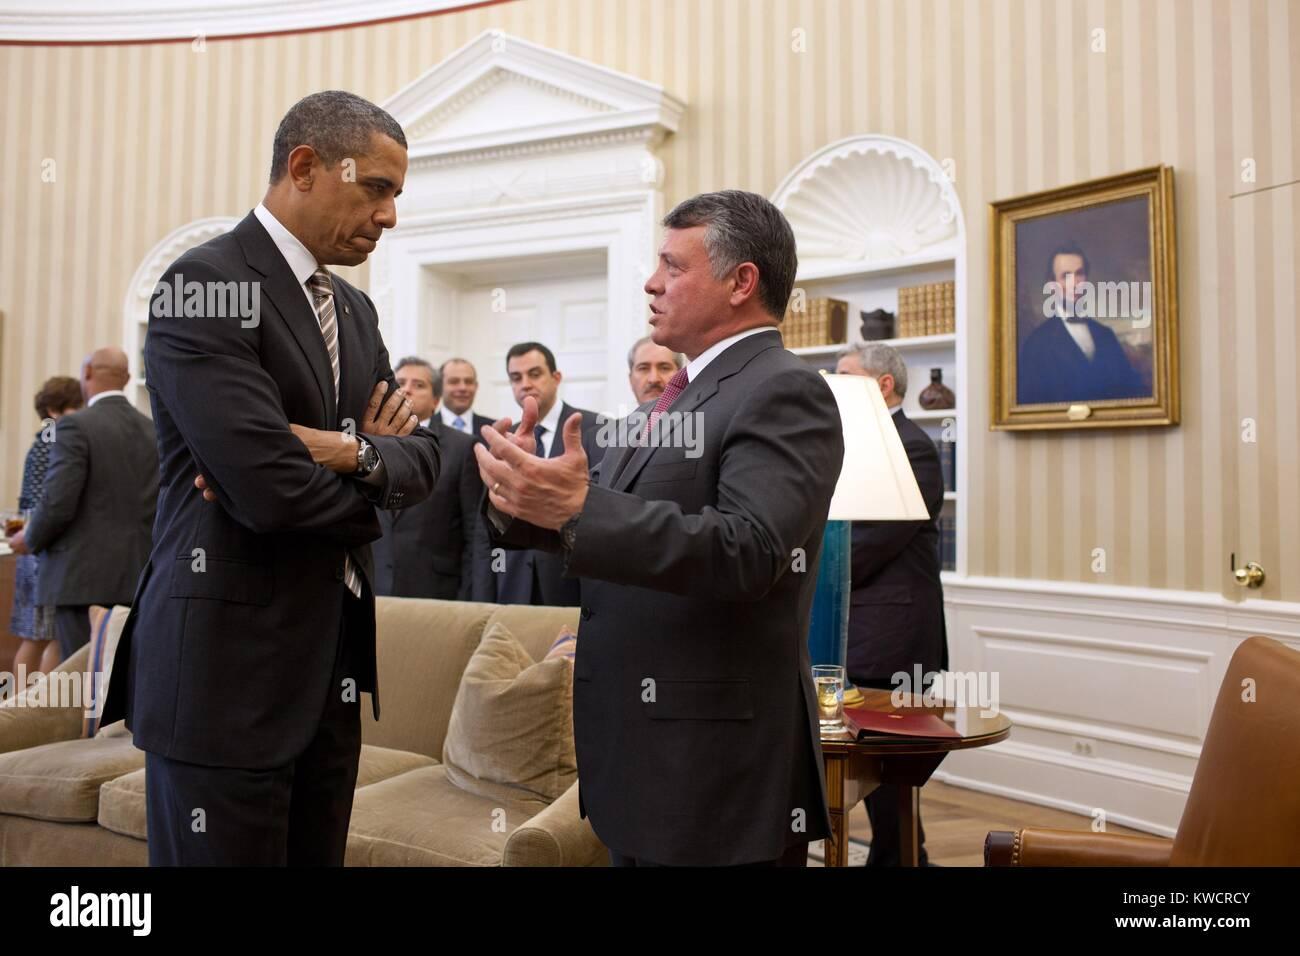 President Barack Obama talks with King Abdullah II of Jordan in Oval Office. Jan. 17, 2012 (BSLOC_2015_3_181) - Stock Image